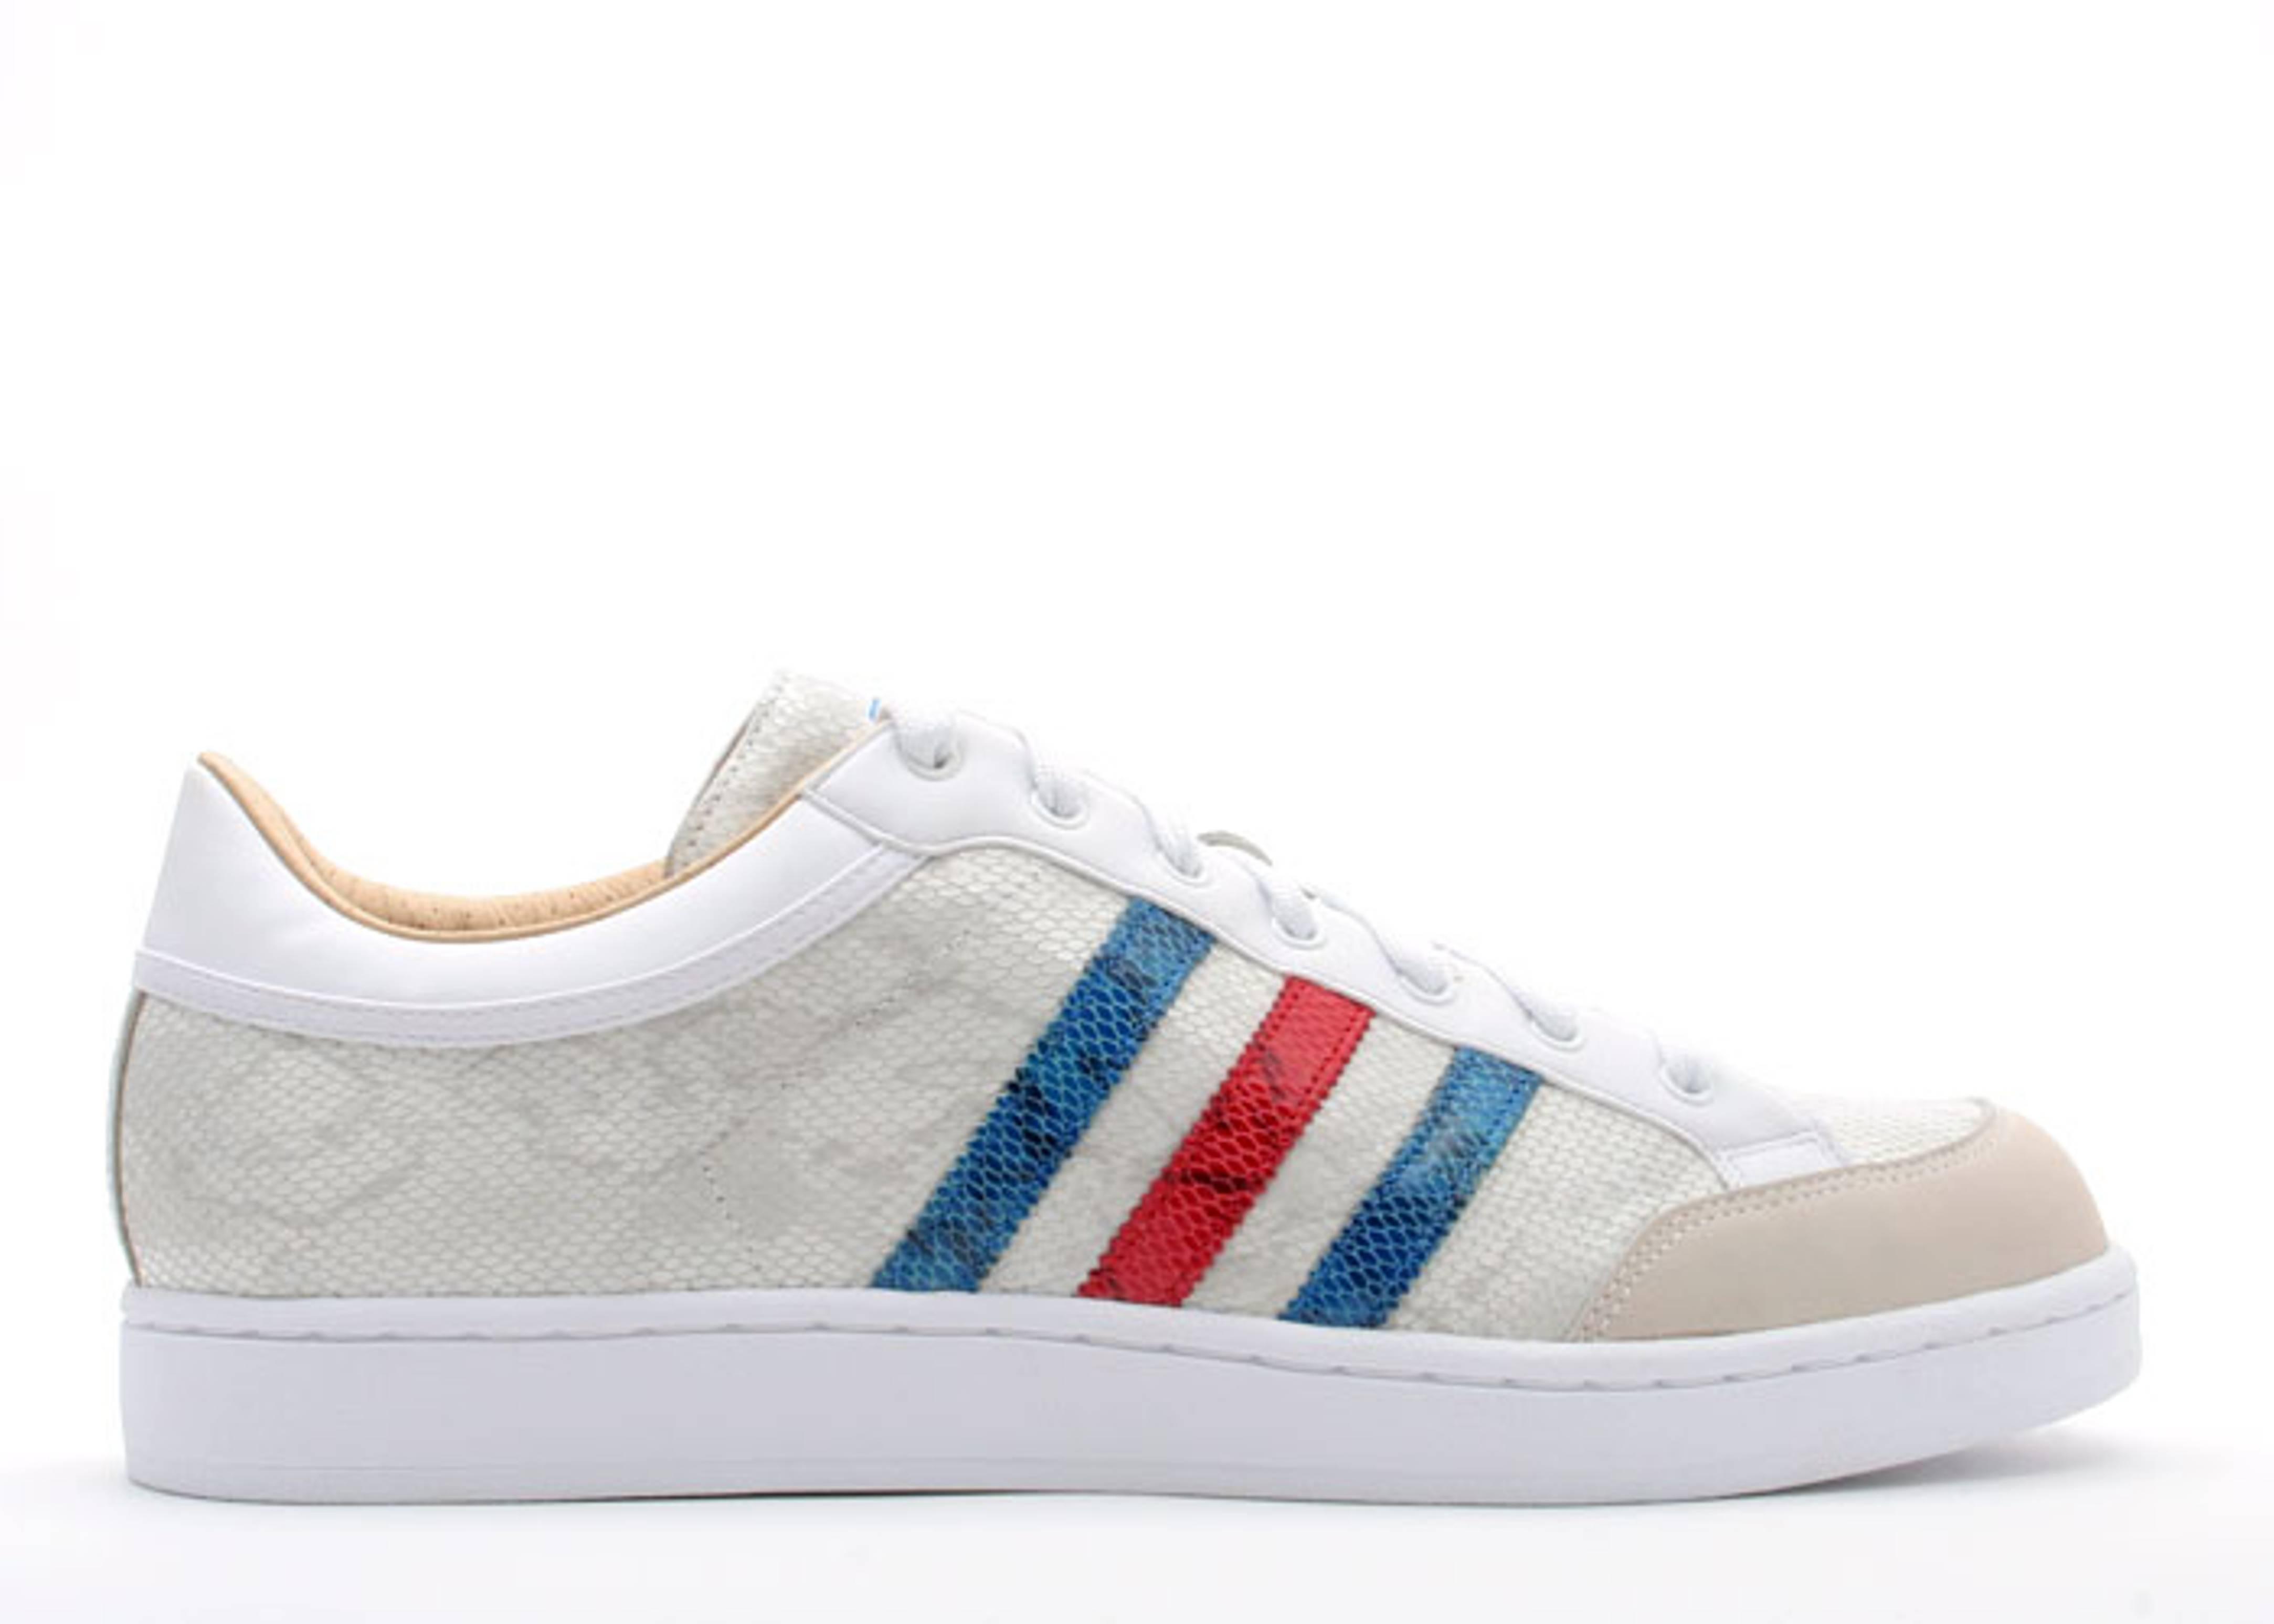 Adidas birdcolredFlight Whiteb Club Americana 659829 Lux XZiOkuPT